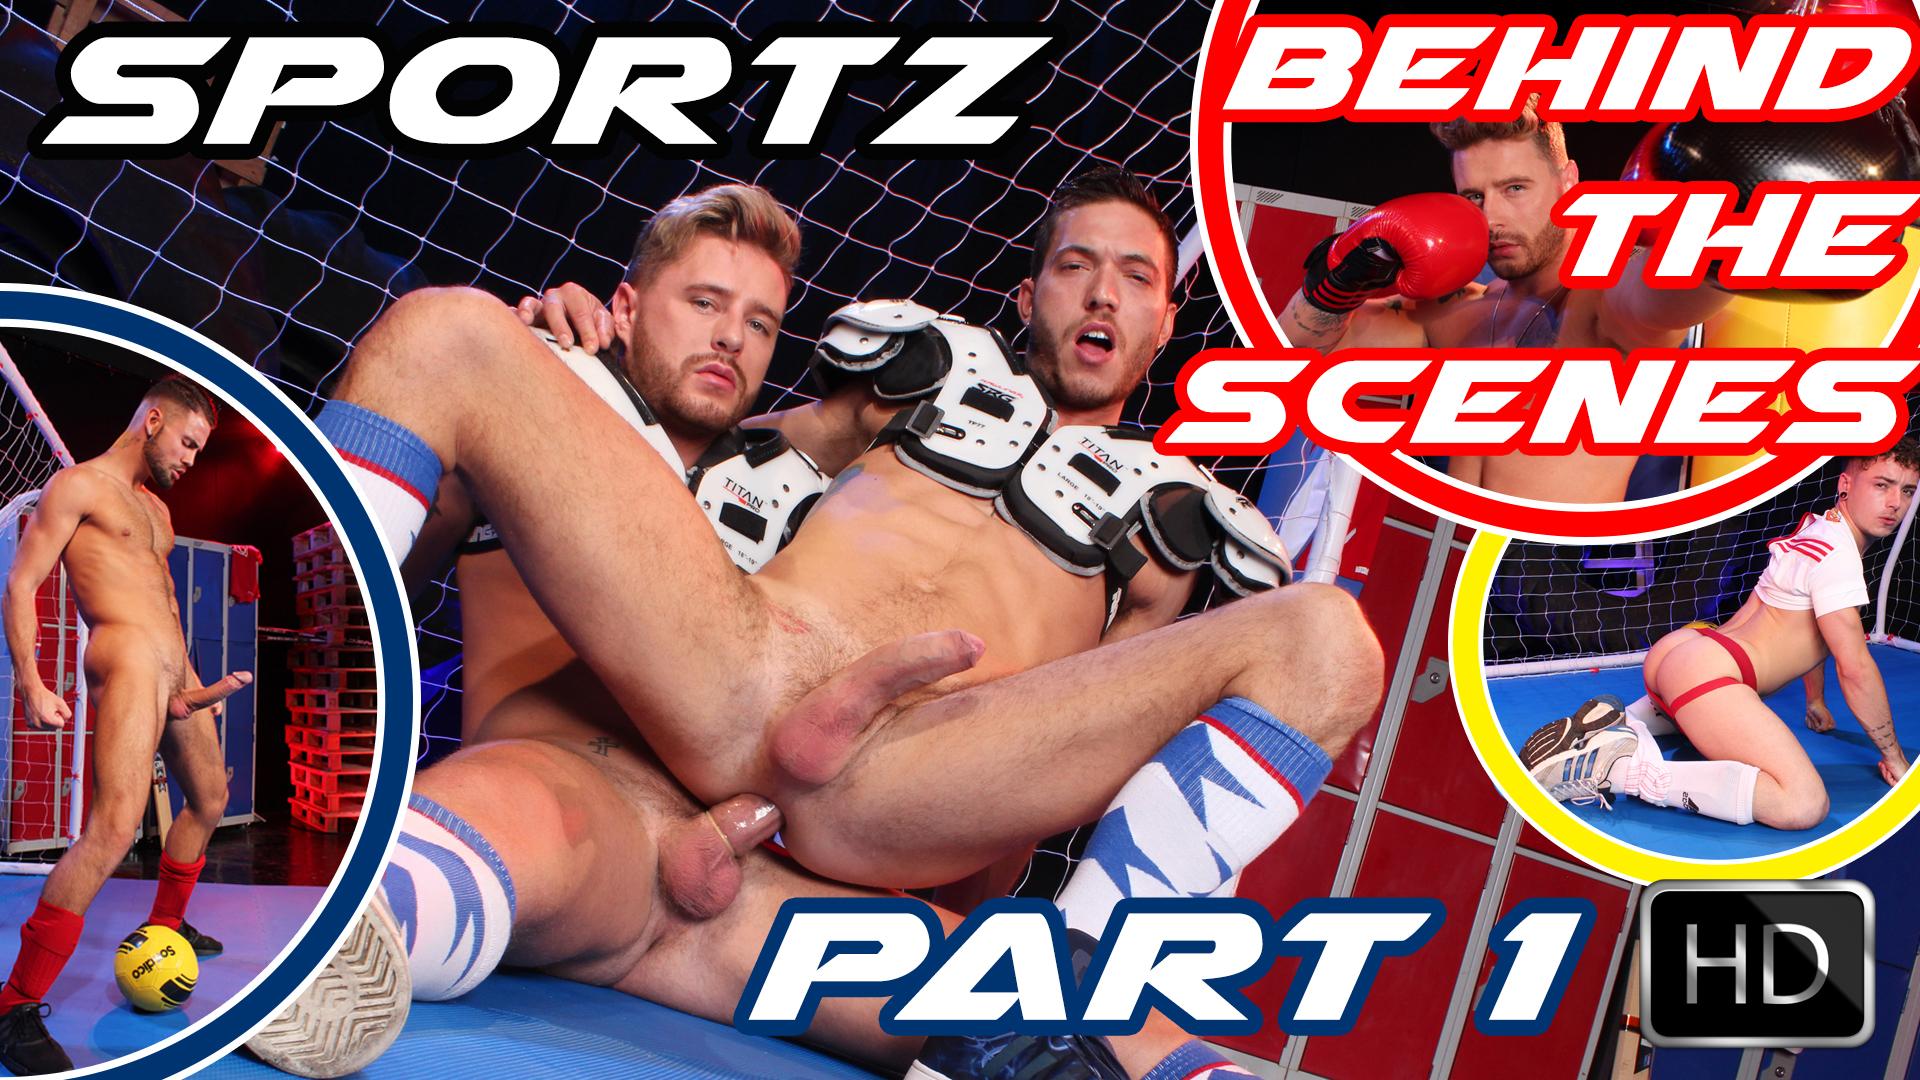 Sportz Bts - Part 1 - UKHotJocks Bbw lesbian mobile porn